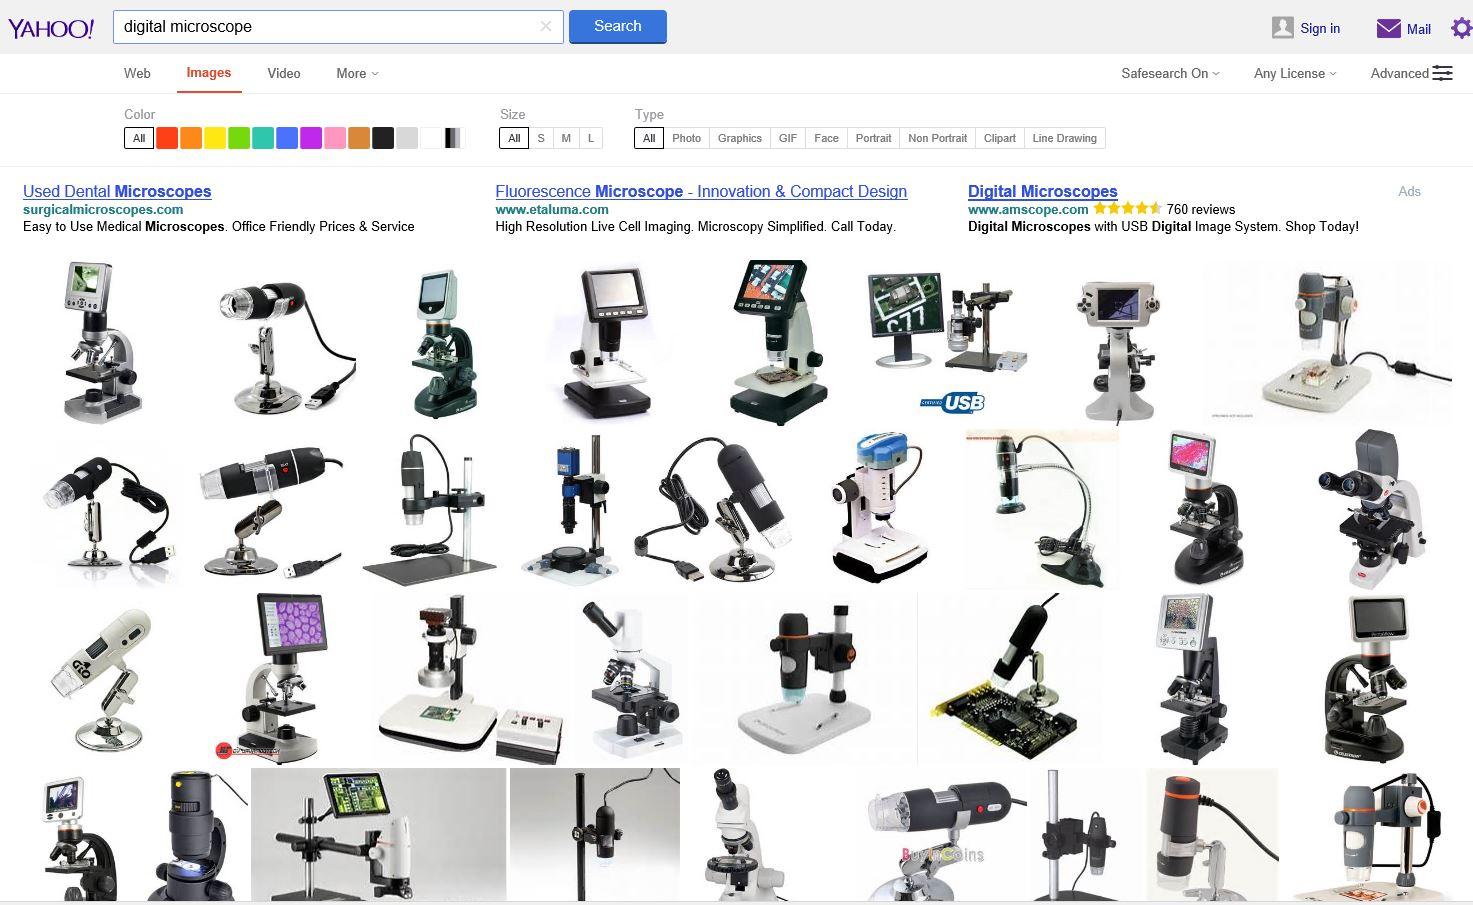 USA Yahoo digital microscope検索結果